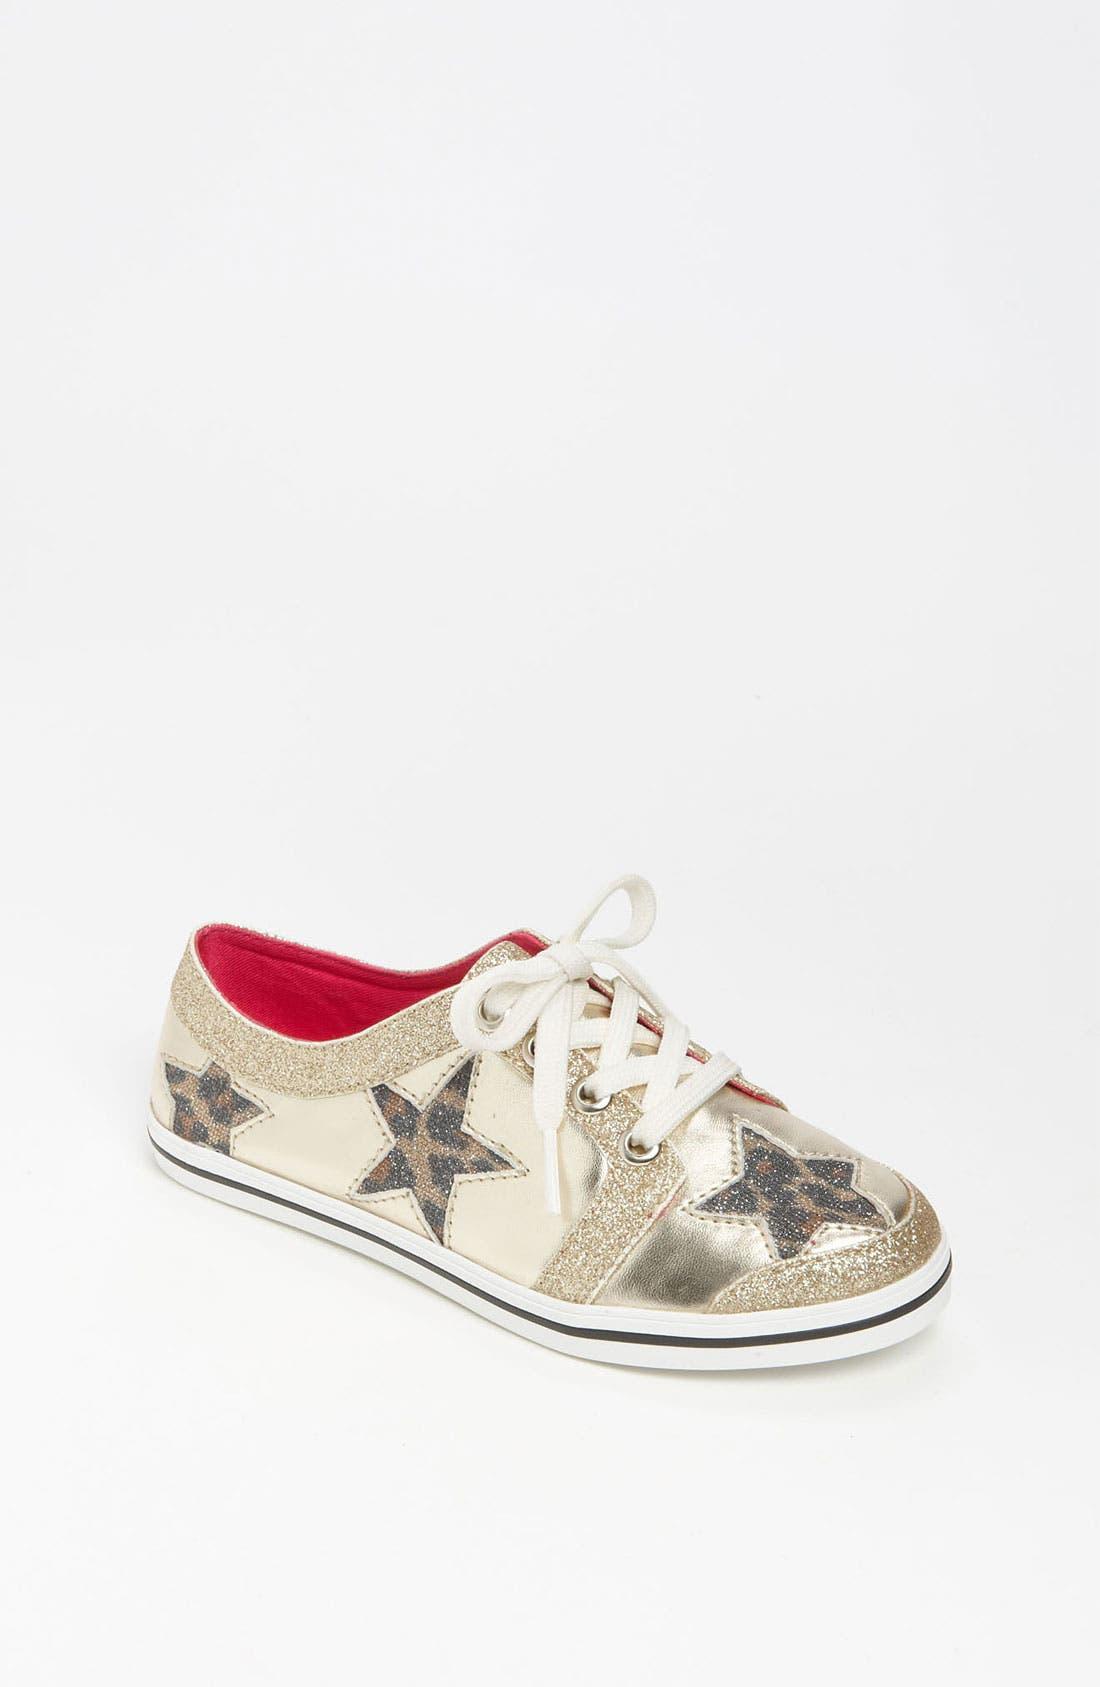 Main Image - Juicy Couture 'Star' Sneaker (Toddler, Little Kid & Big Kid)